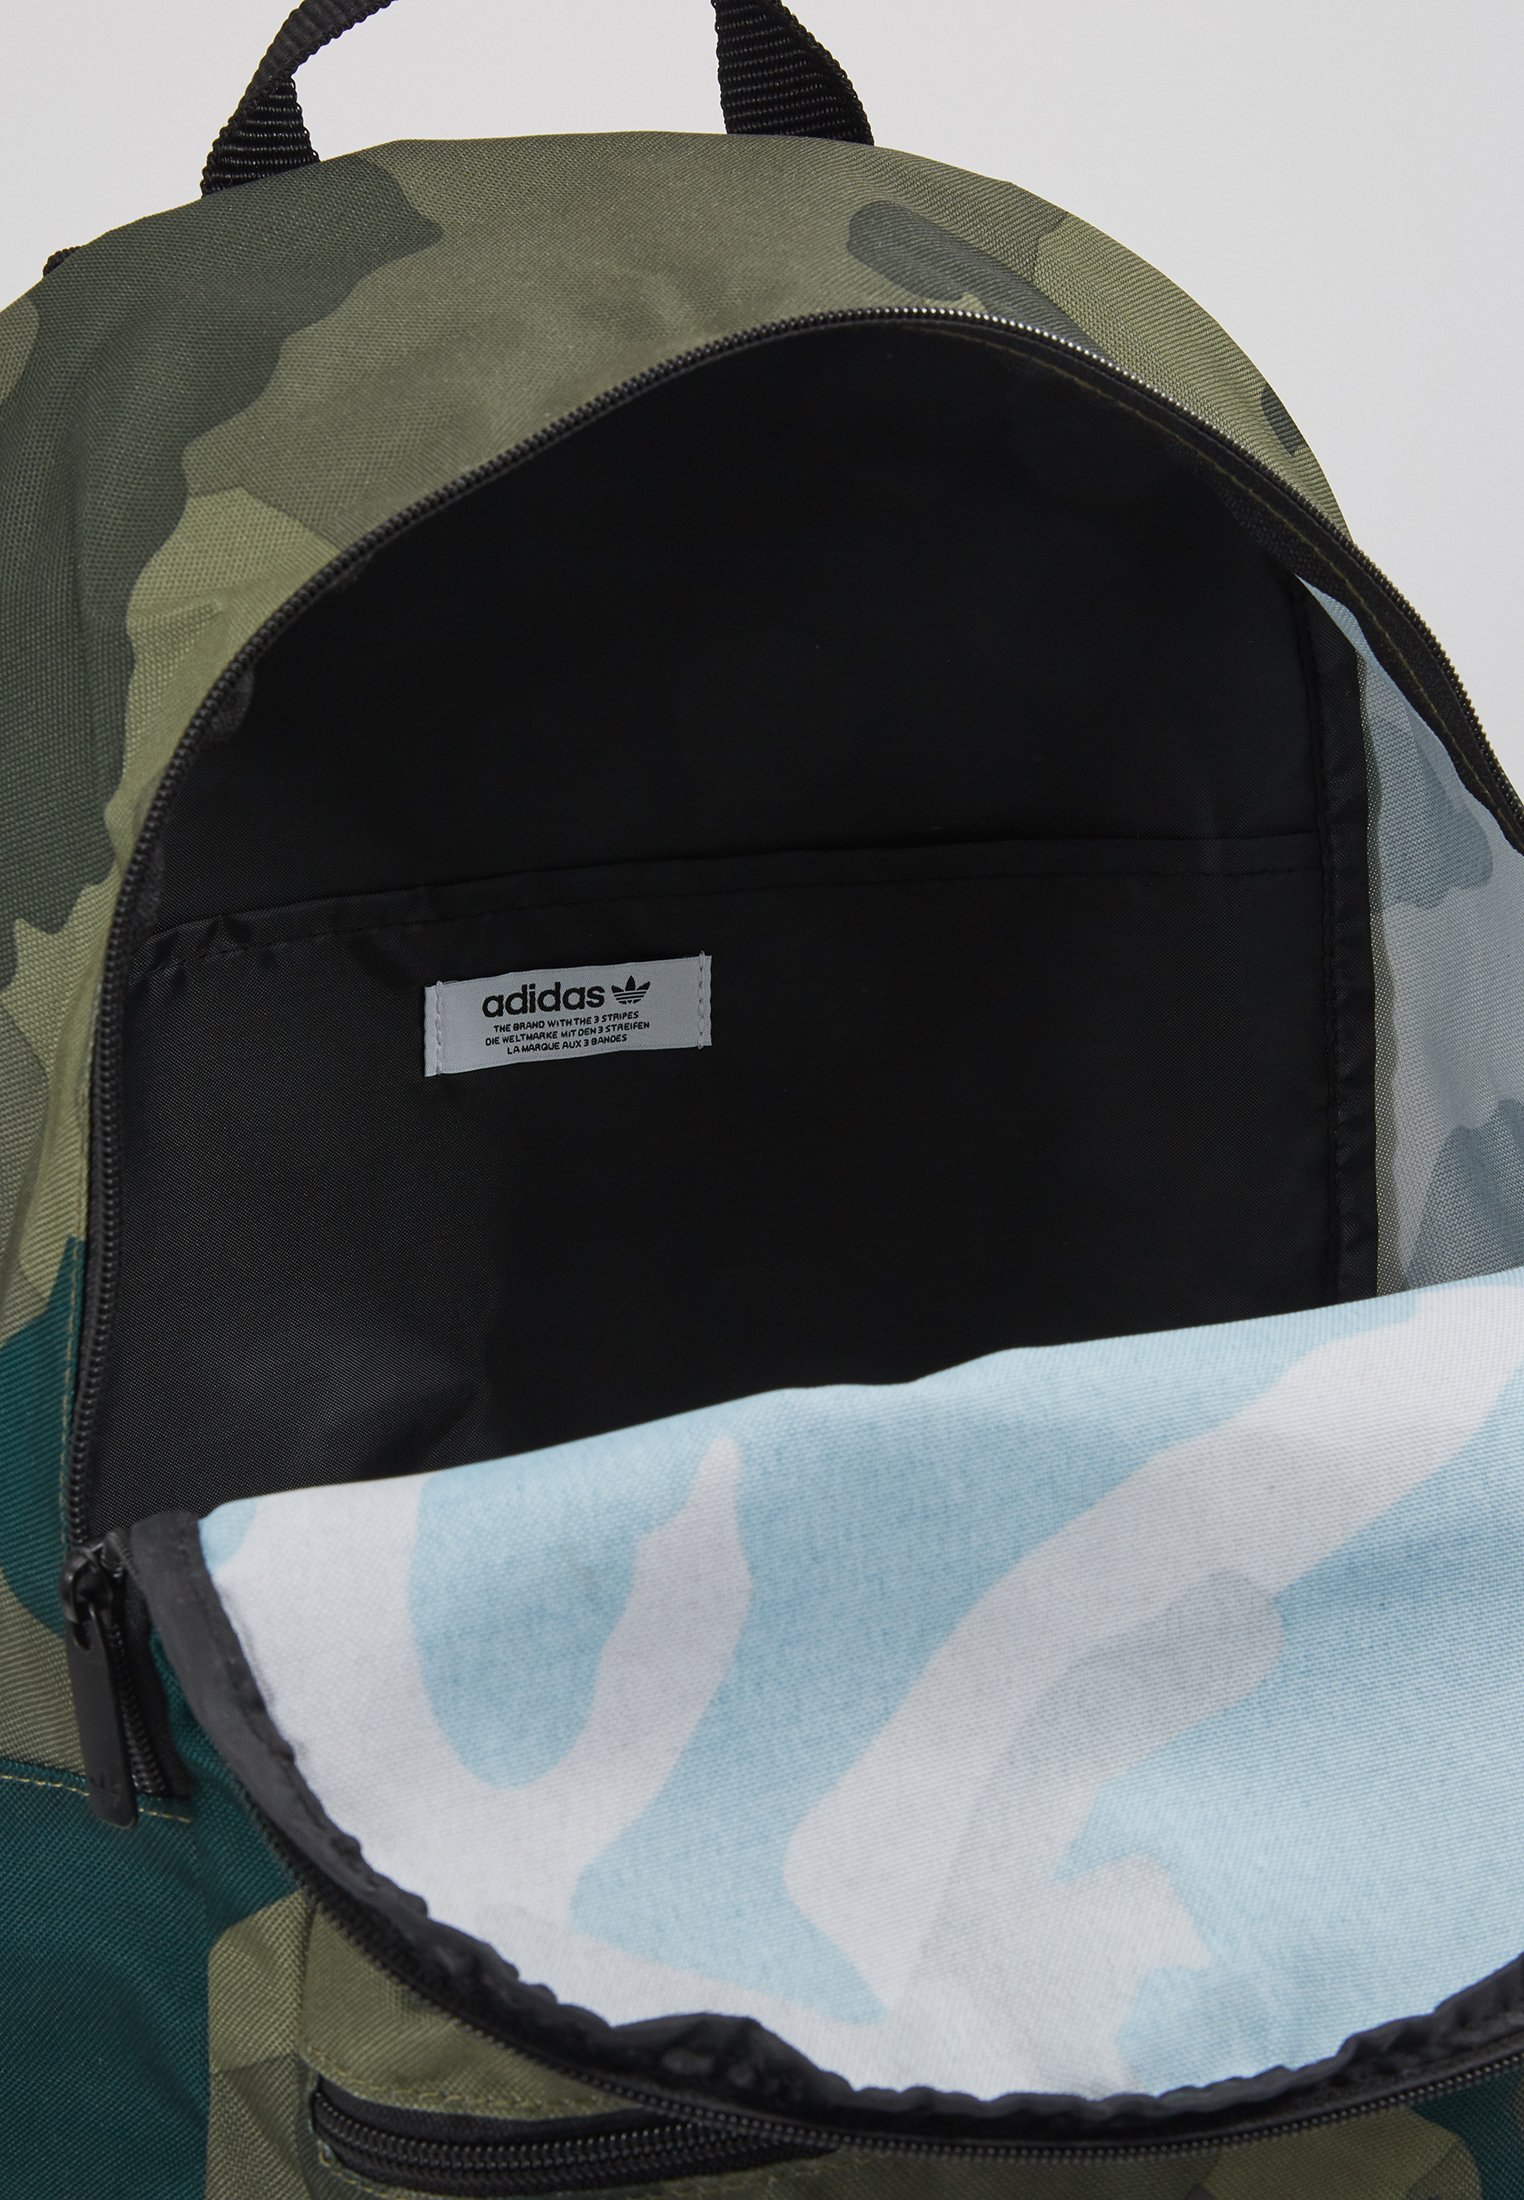 adidas Originals CAM - Ryggsekk - khaki 1mgaBF4y0BVqJv3